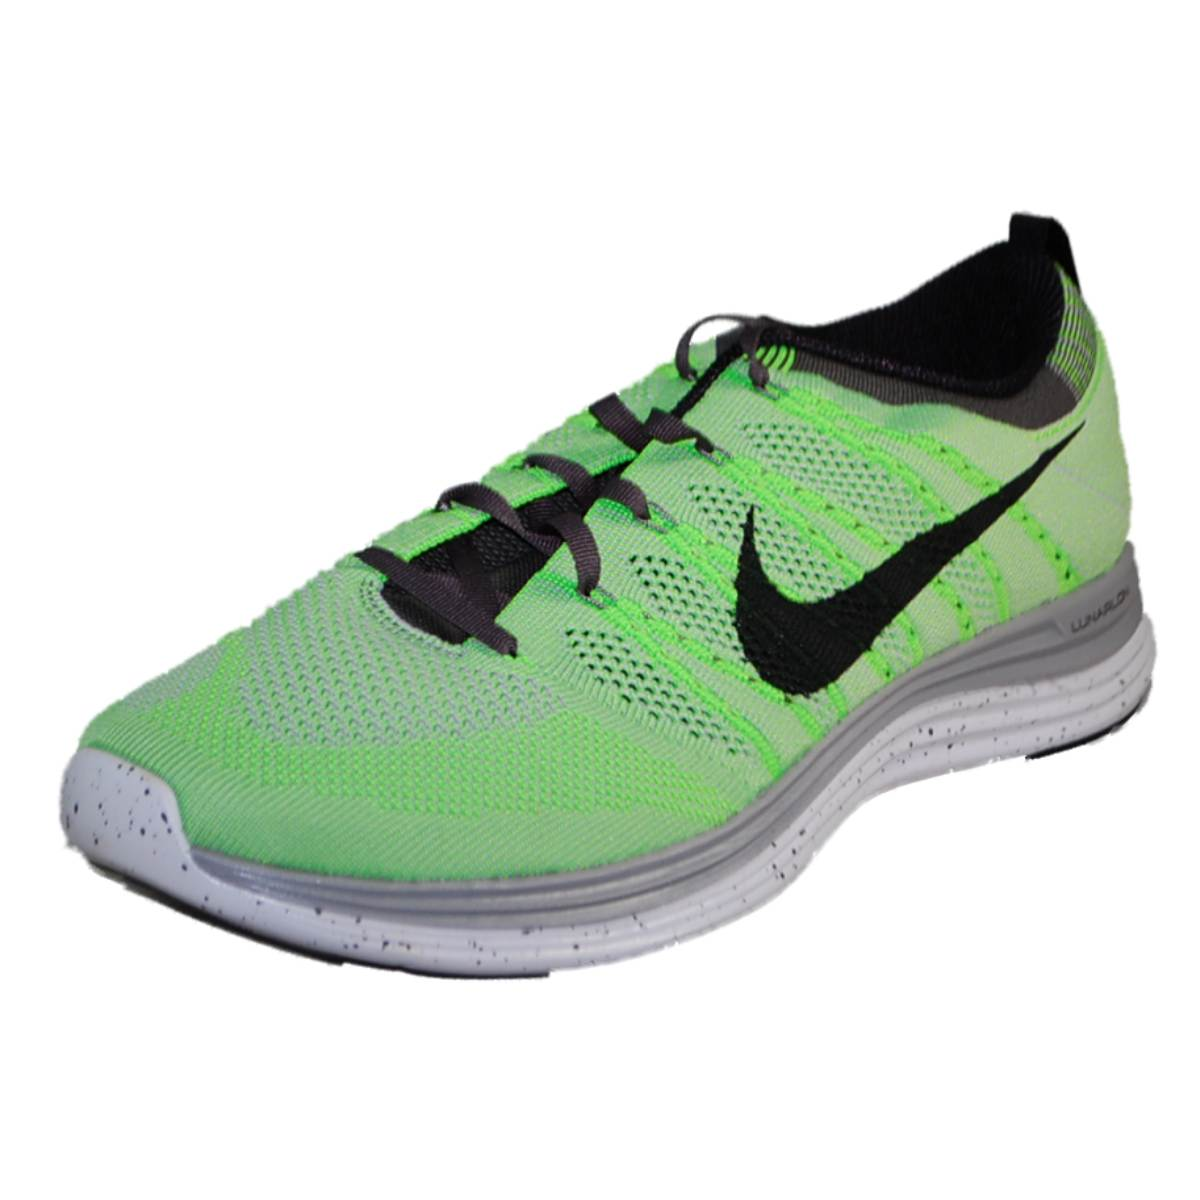 Nike Mens NIKE FLYKNIT ONE+ Green Running Shoes | EBay